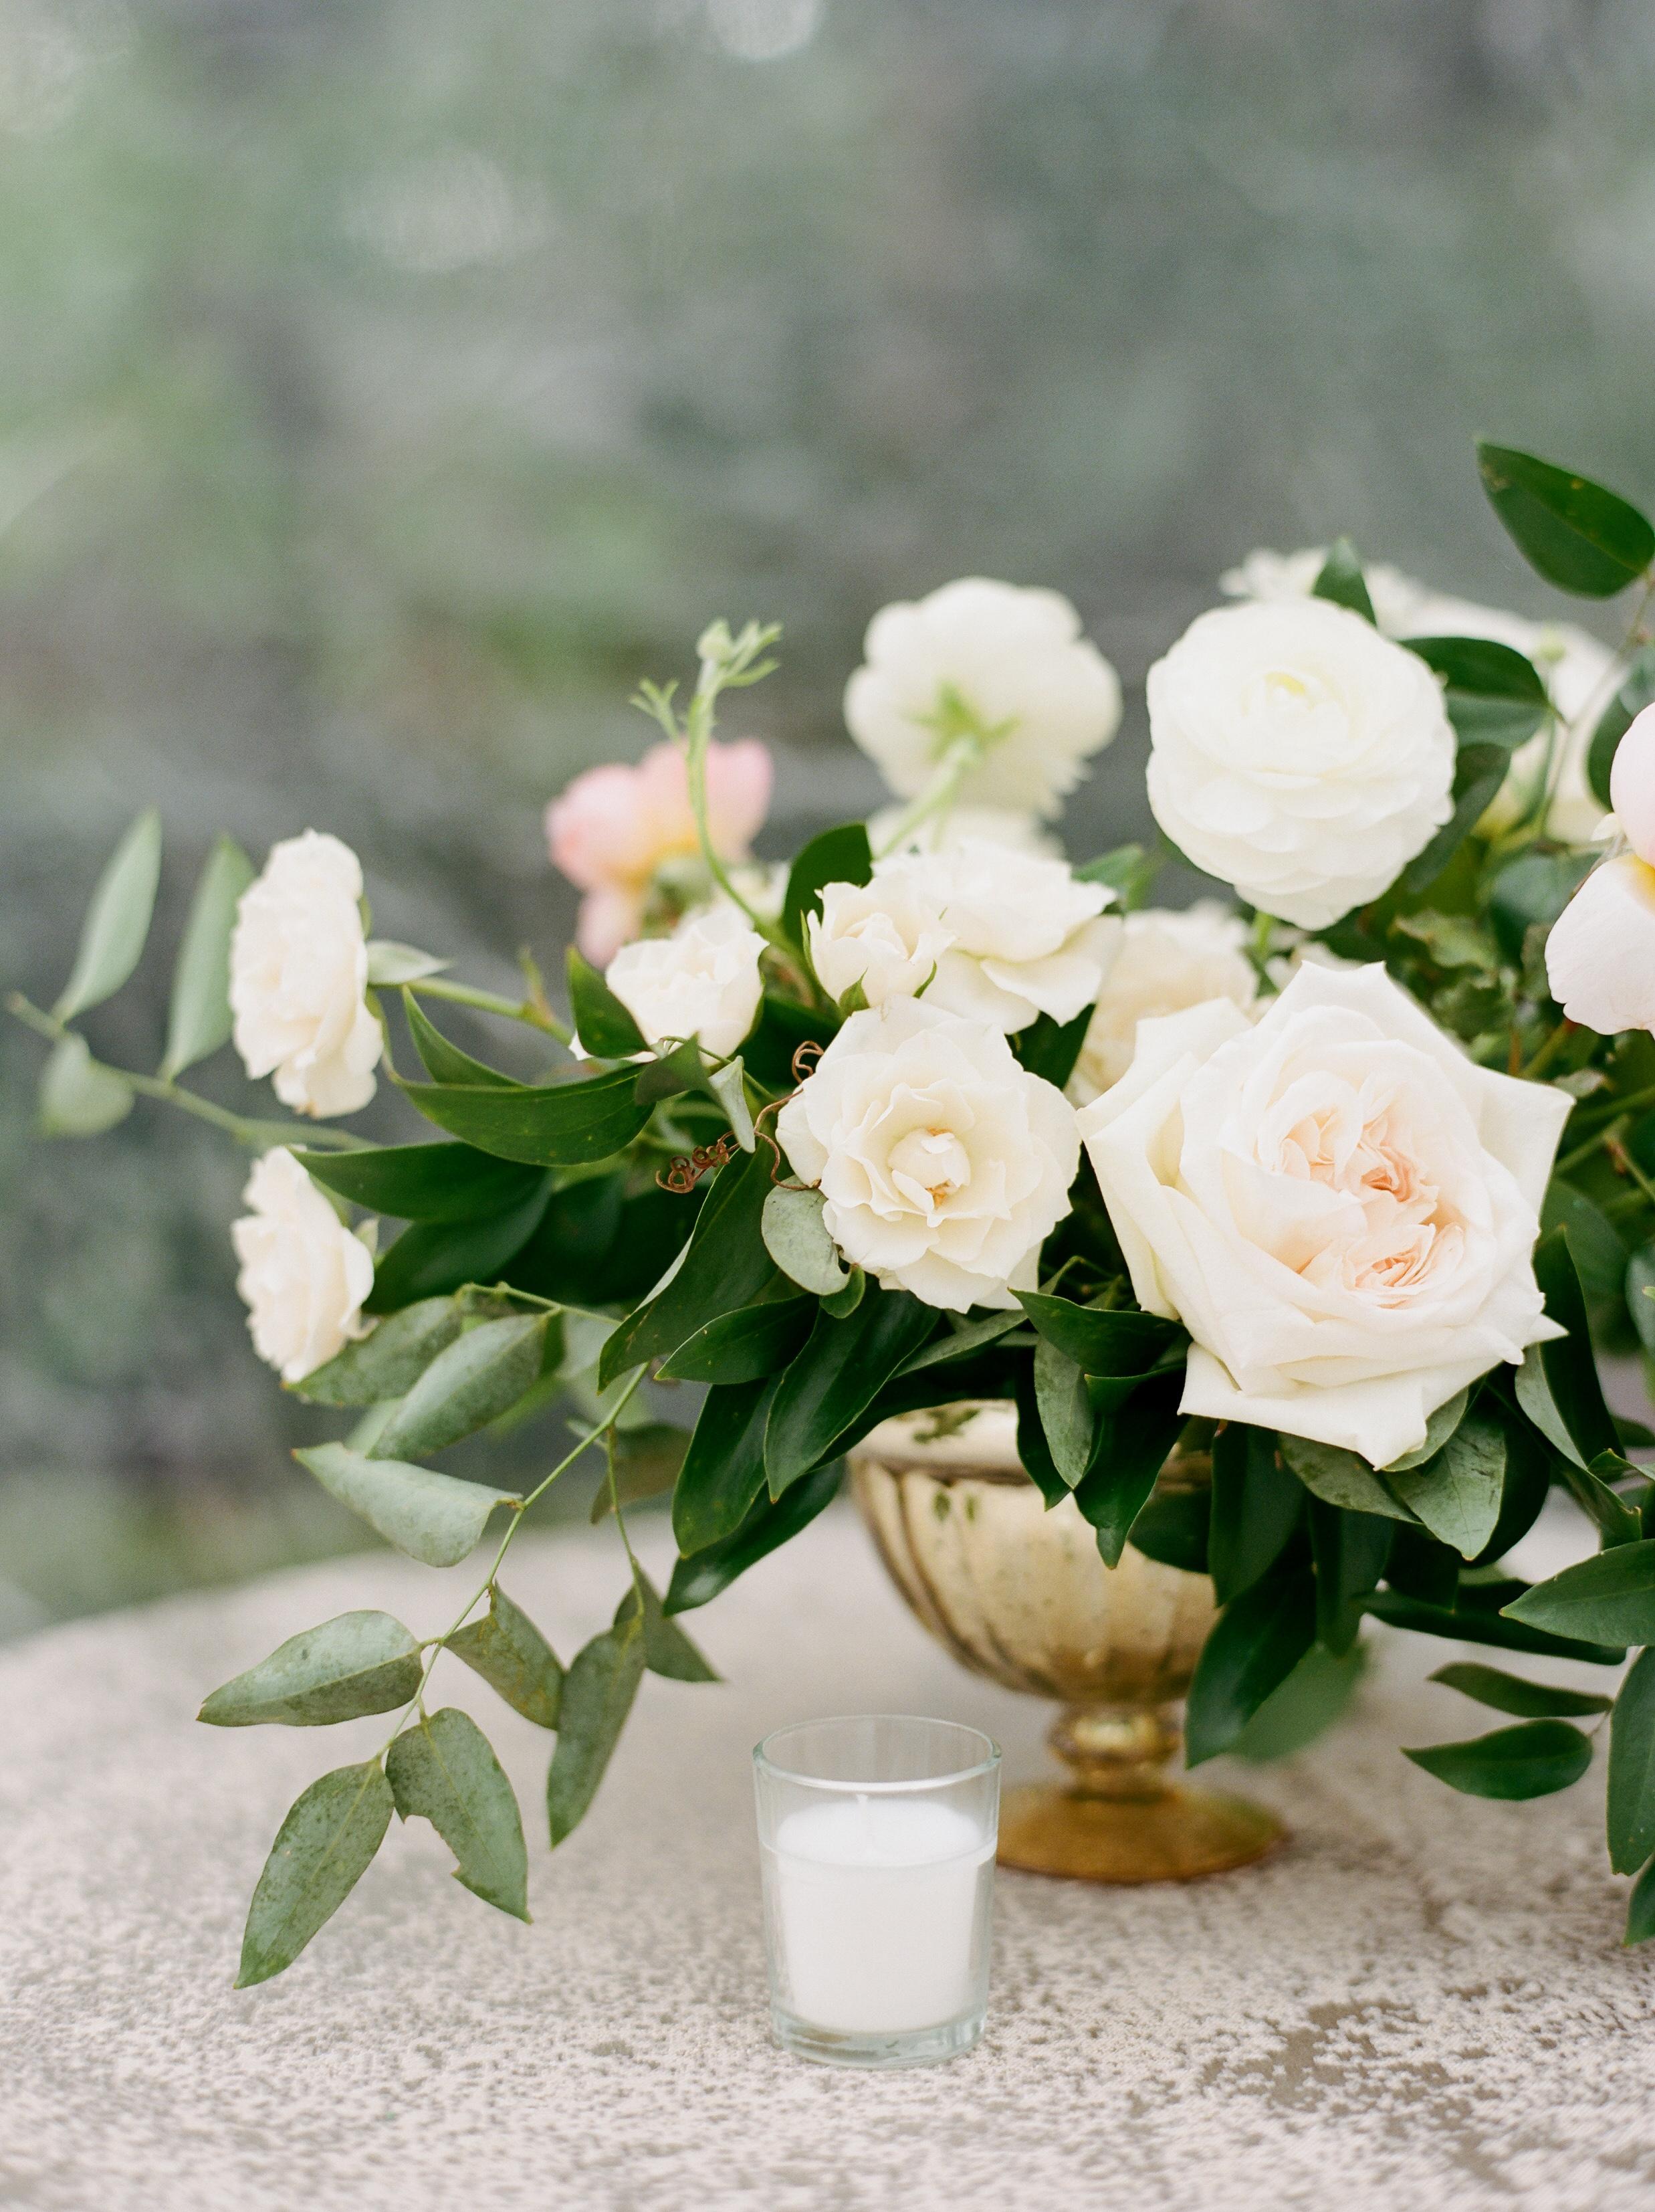 Garden style wedding arrangement | Luxe backyard wedding in Houston